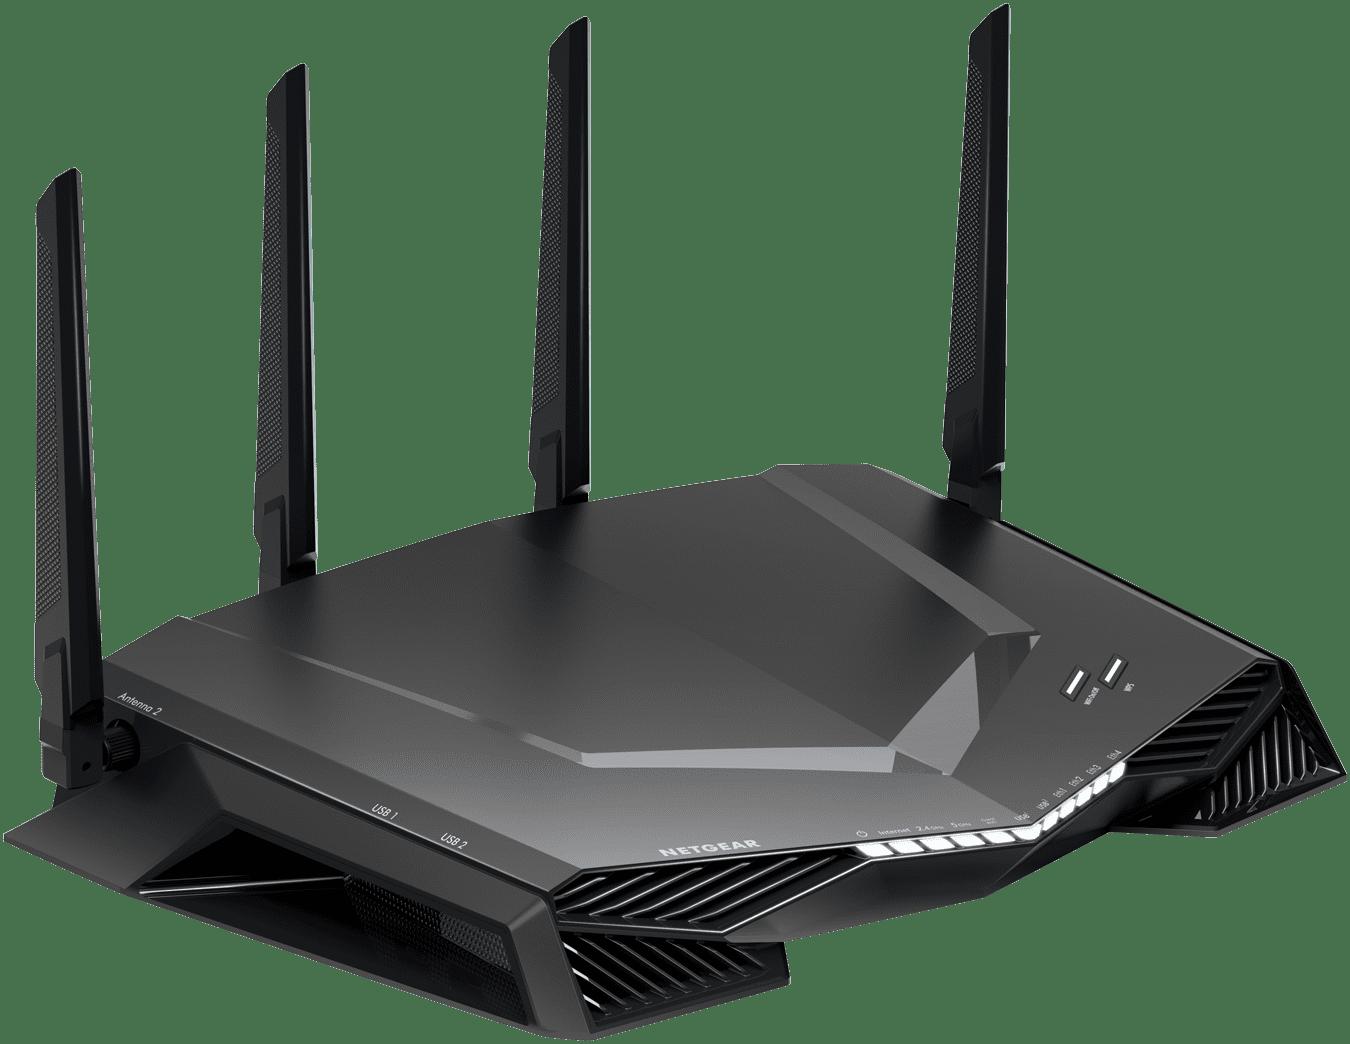 NETGEAR Nighthawk Pro Gaming WiFi Router, AC2600 Dual band wireless, Gigabit Ethernet (XR500) by NETGEAR